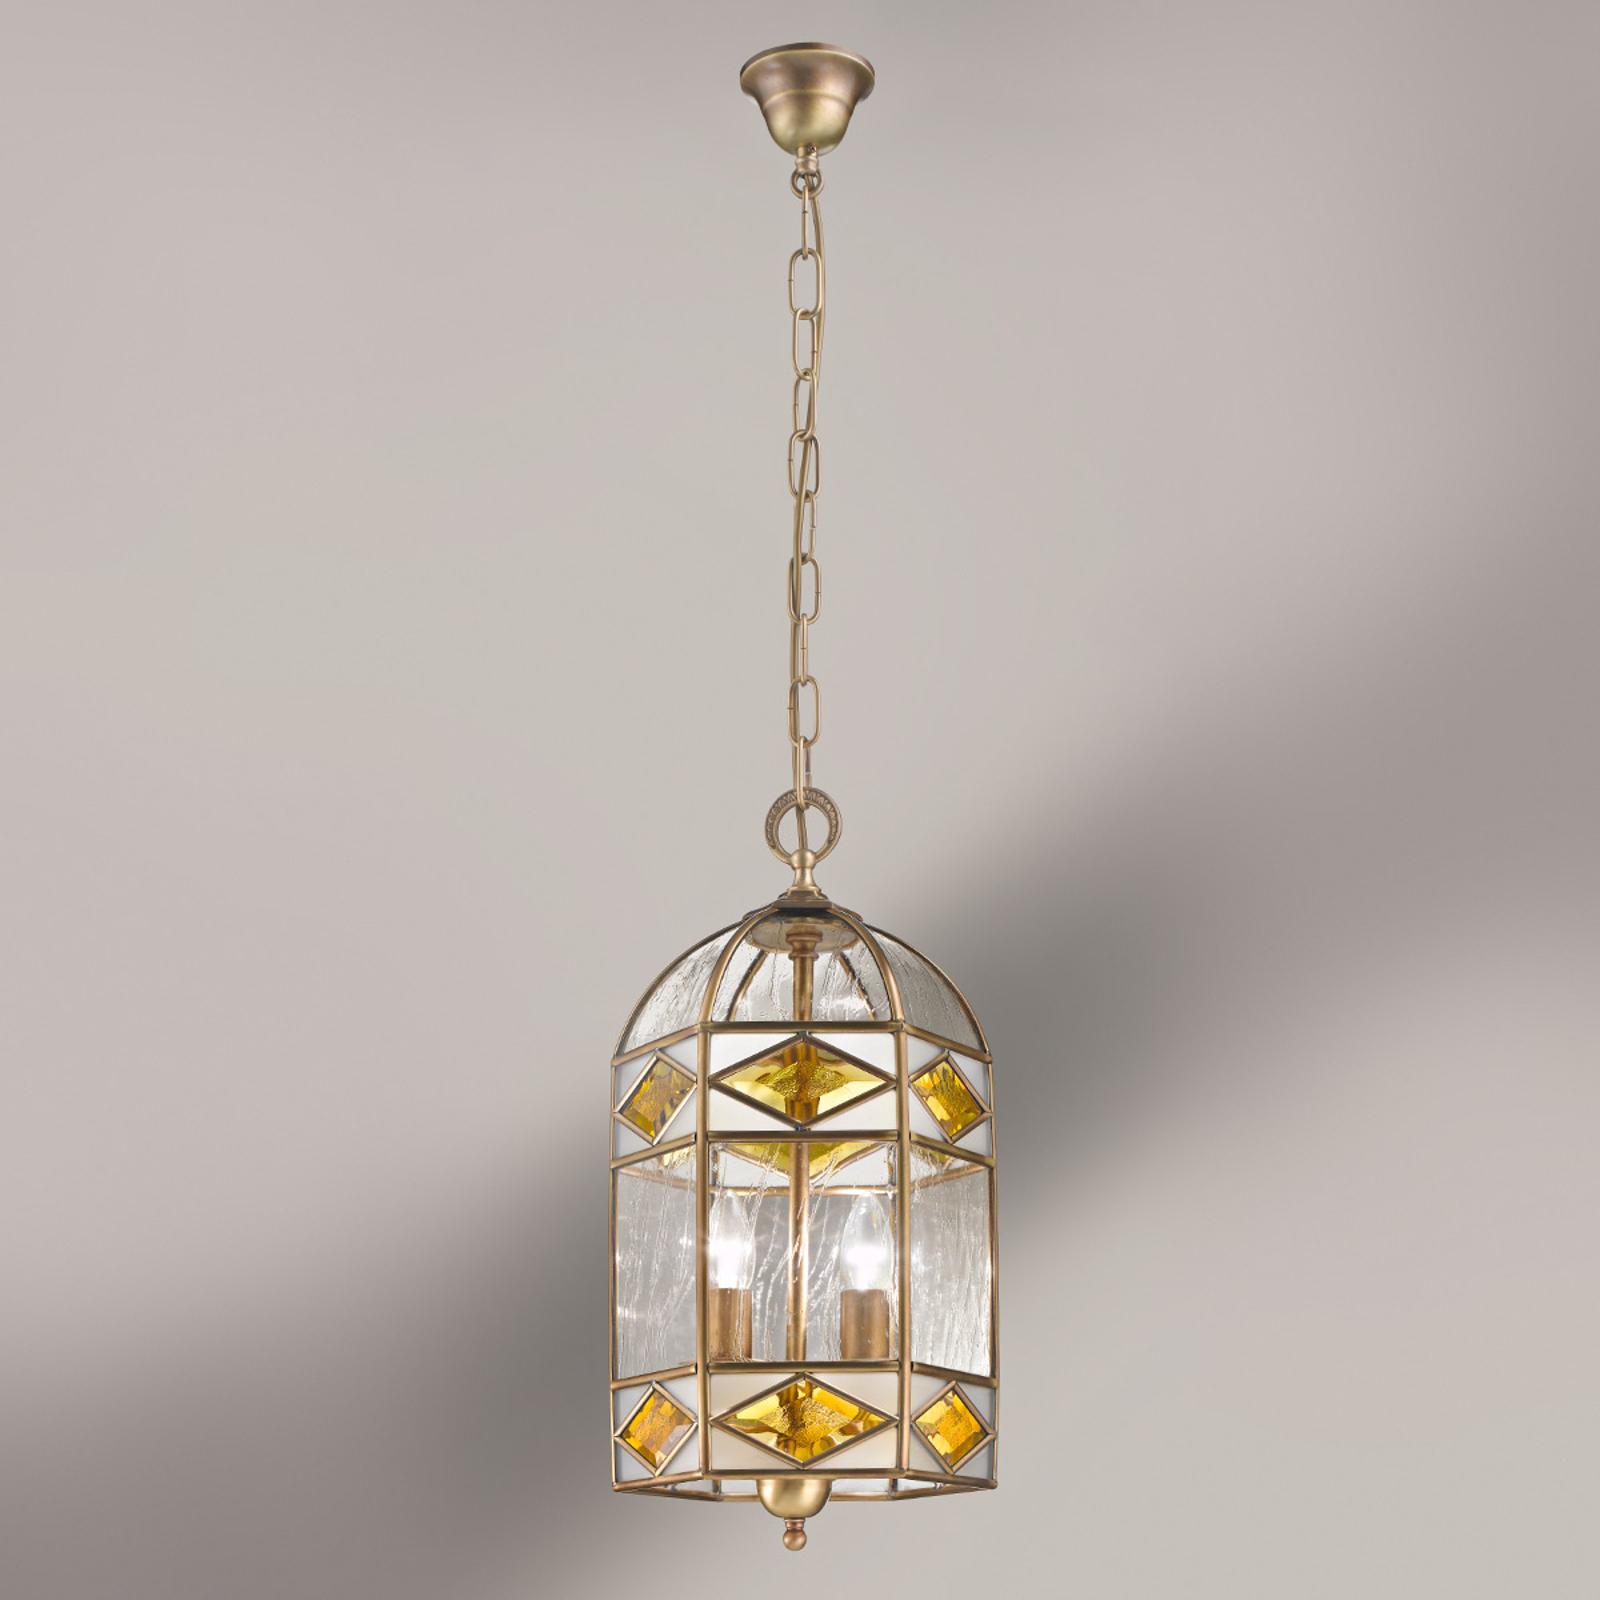 Emilia - suspension avec verre cathédrale